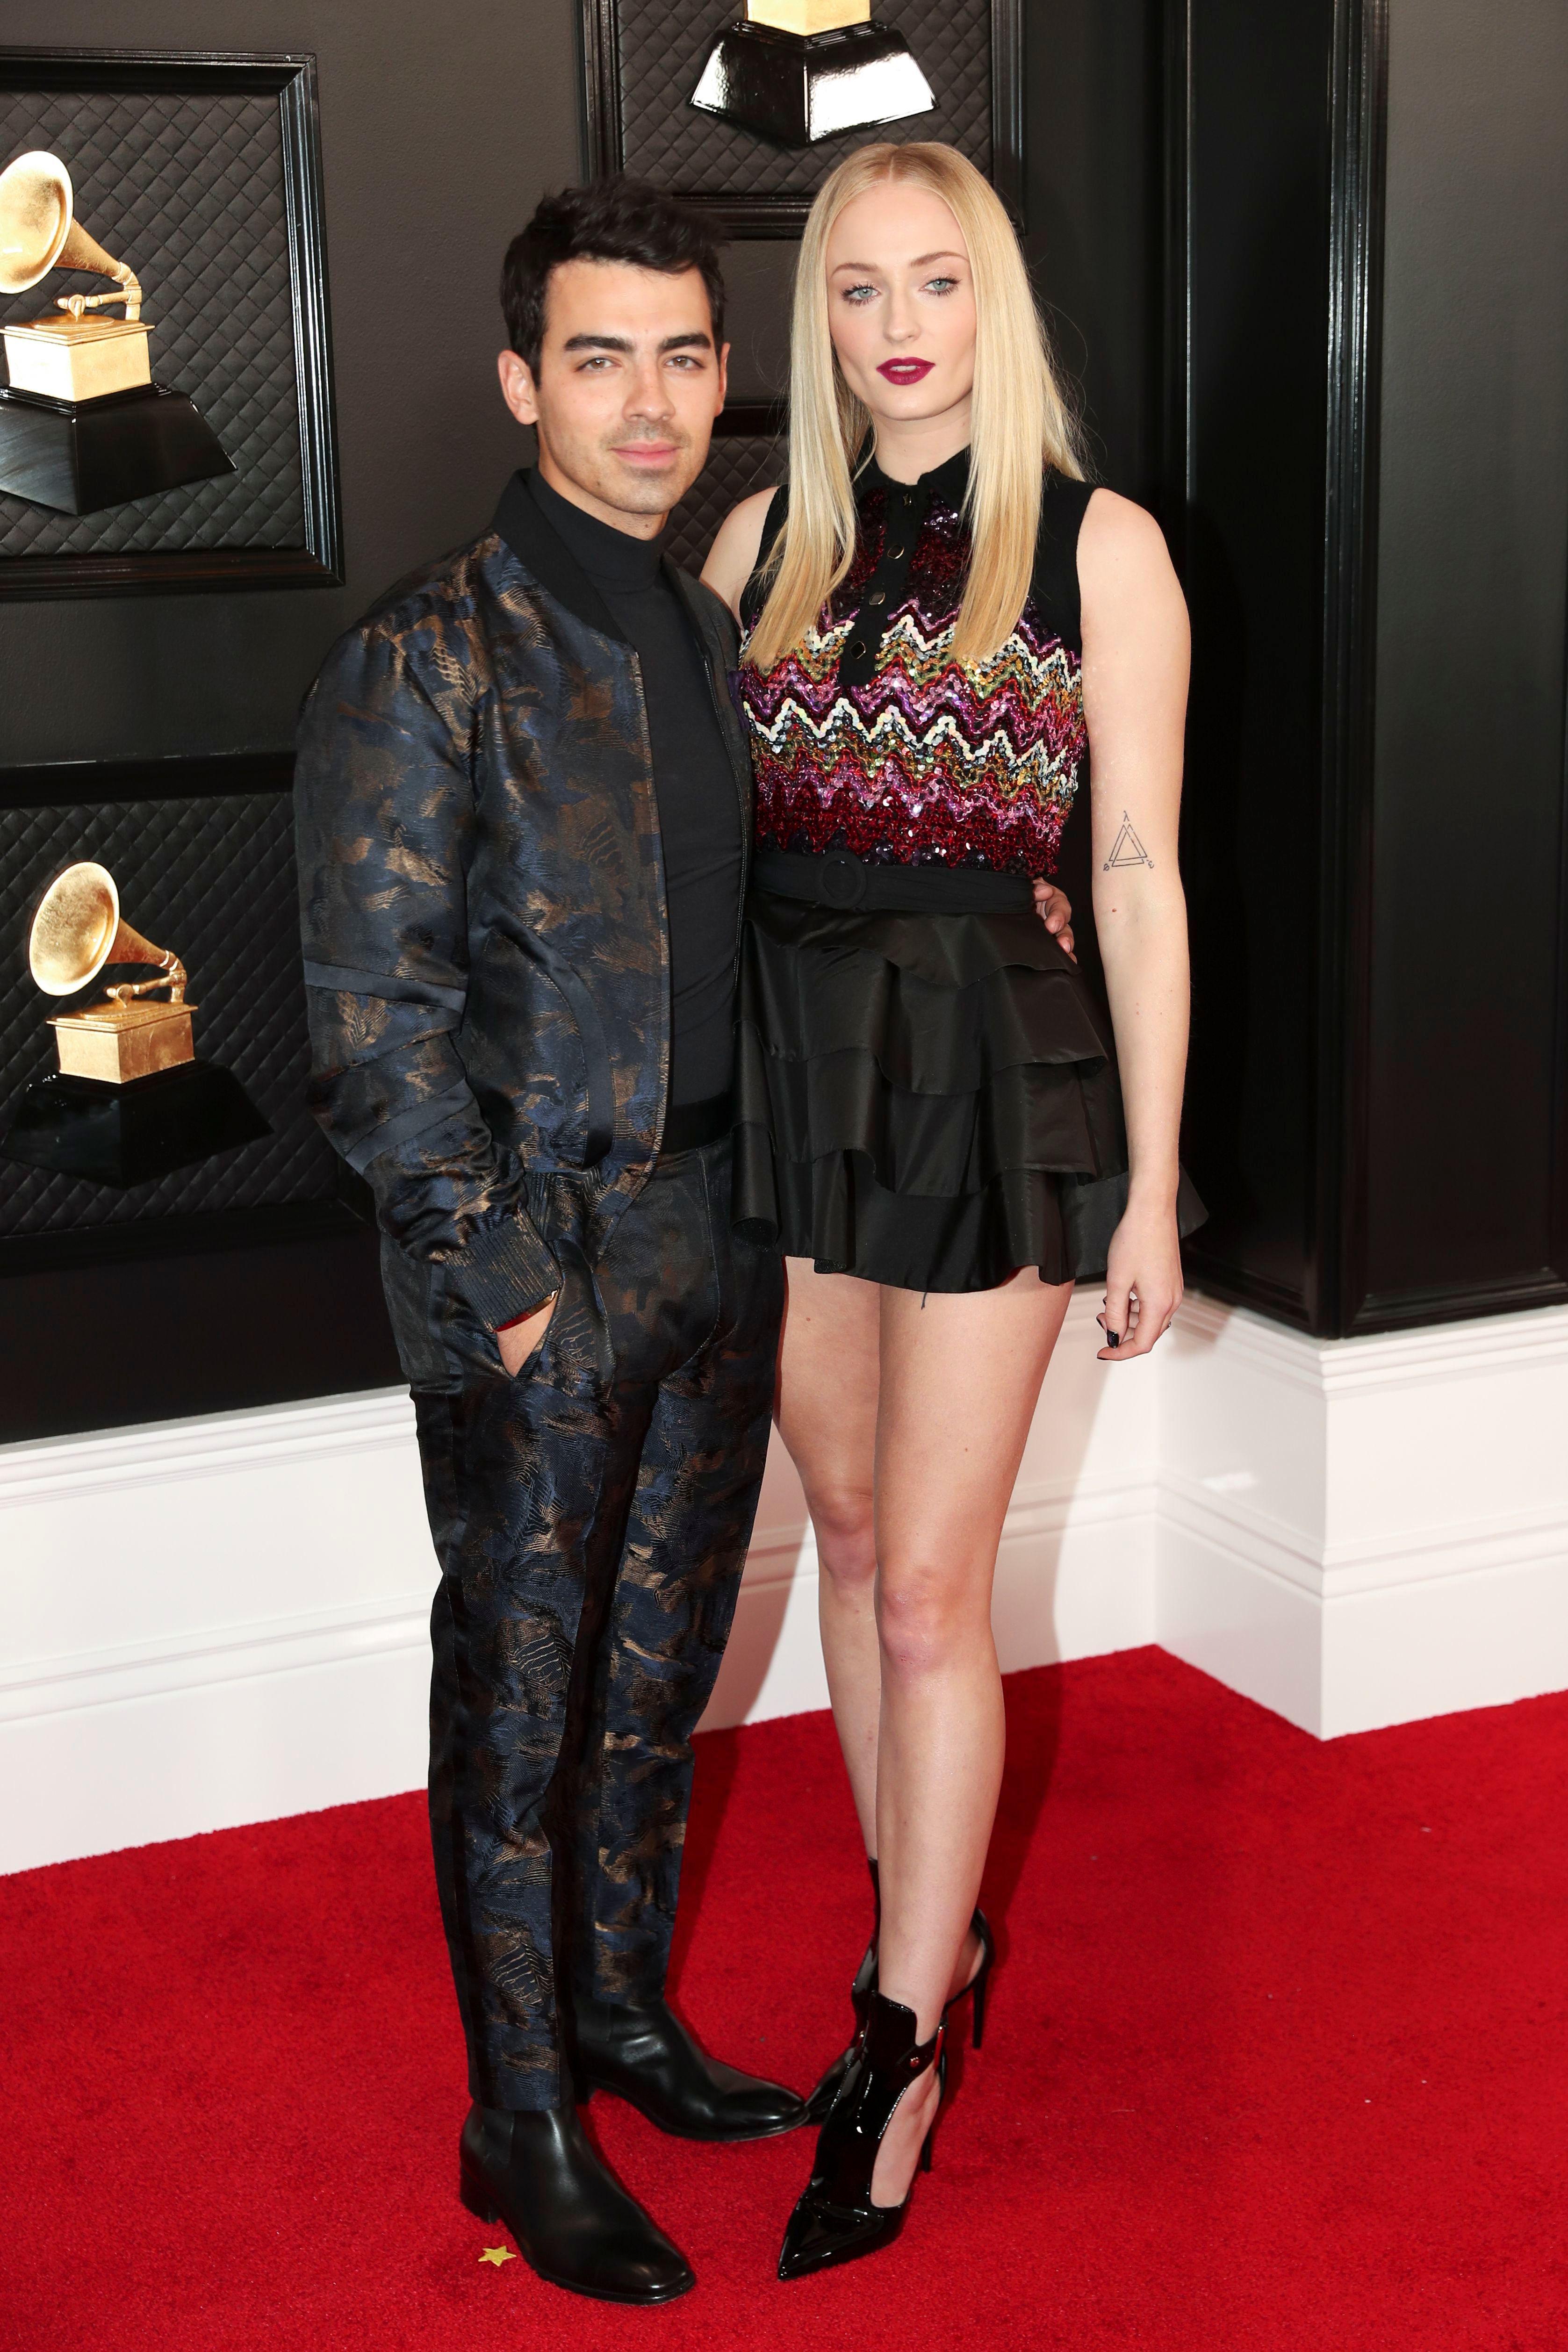 Killin' It! Joe Jonas and Sophie Turner Own the Grammys Red Carpet in Matching Dark Looks